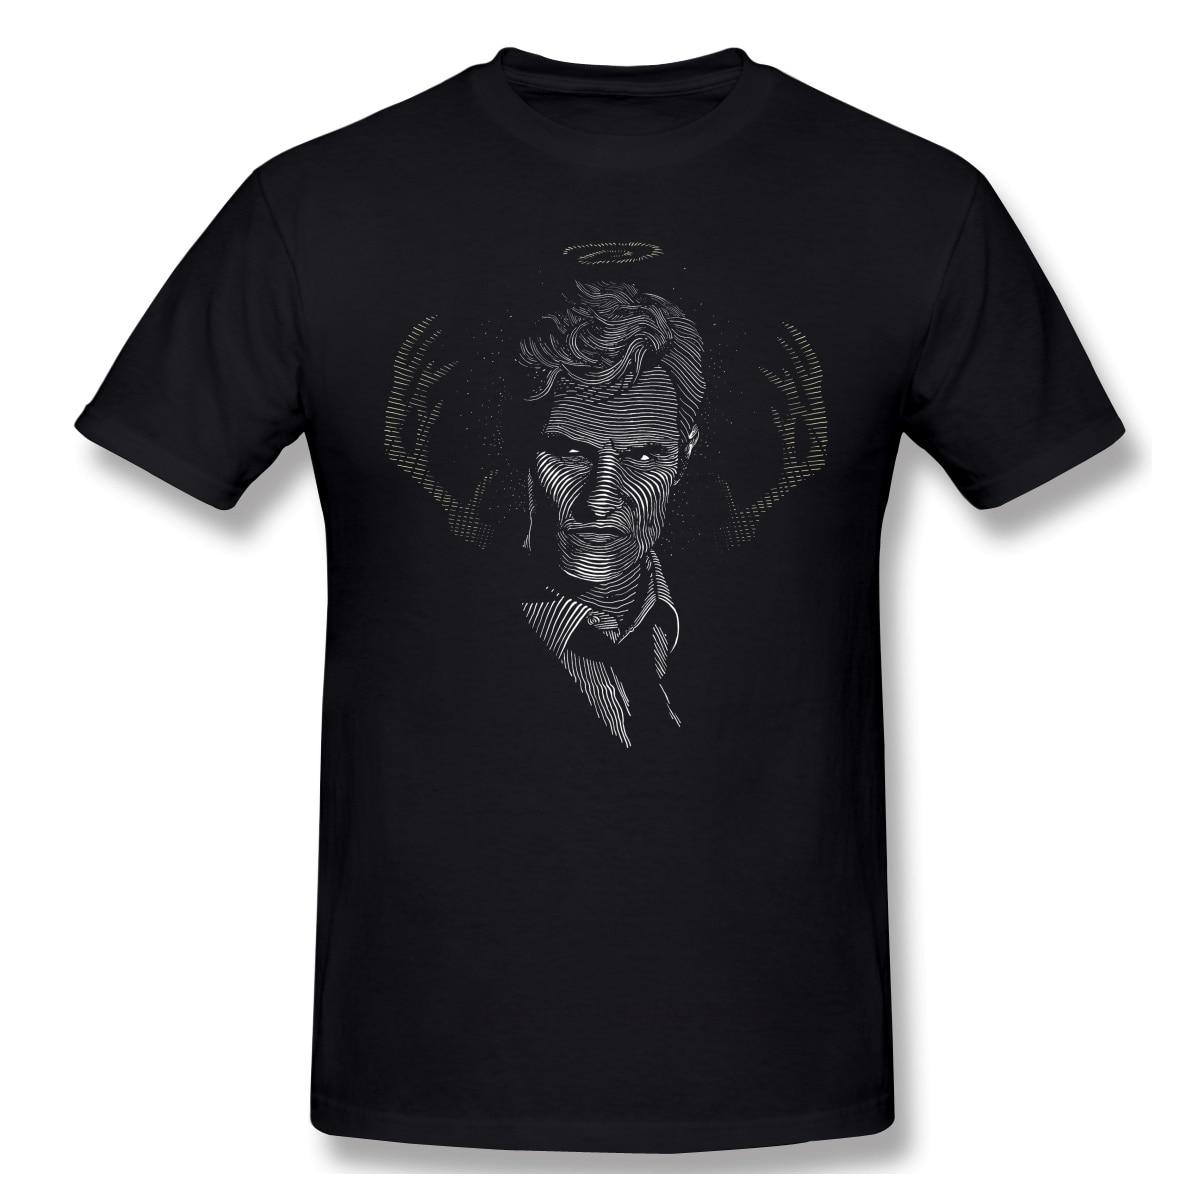 Camiseta negra de la serie de TV americana para hombre, Camiseta de...